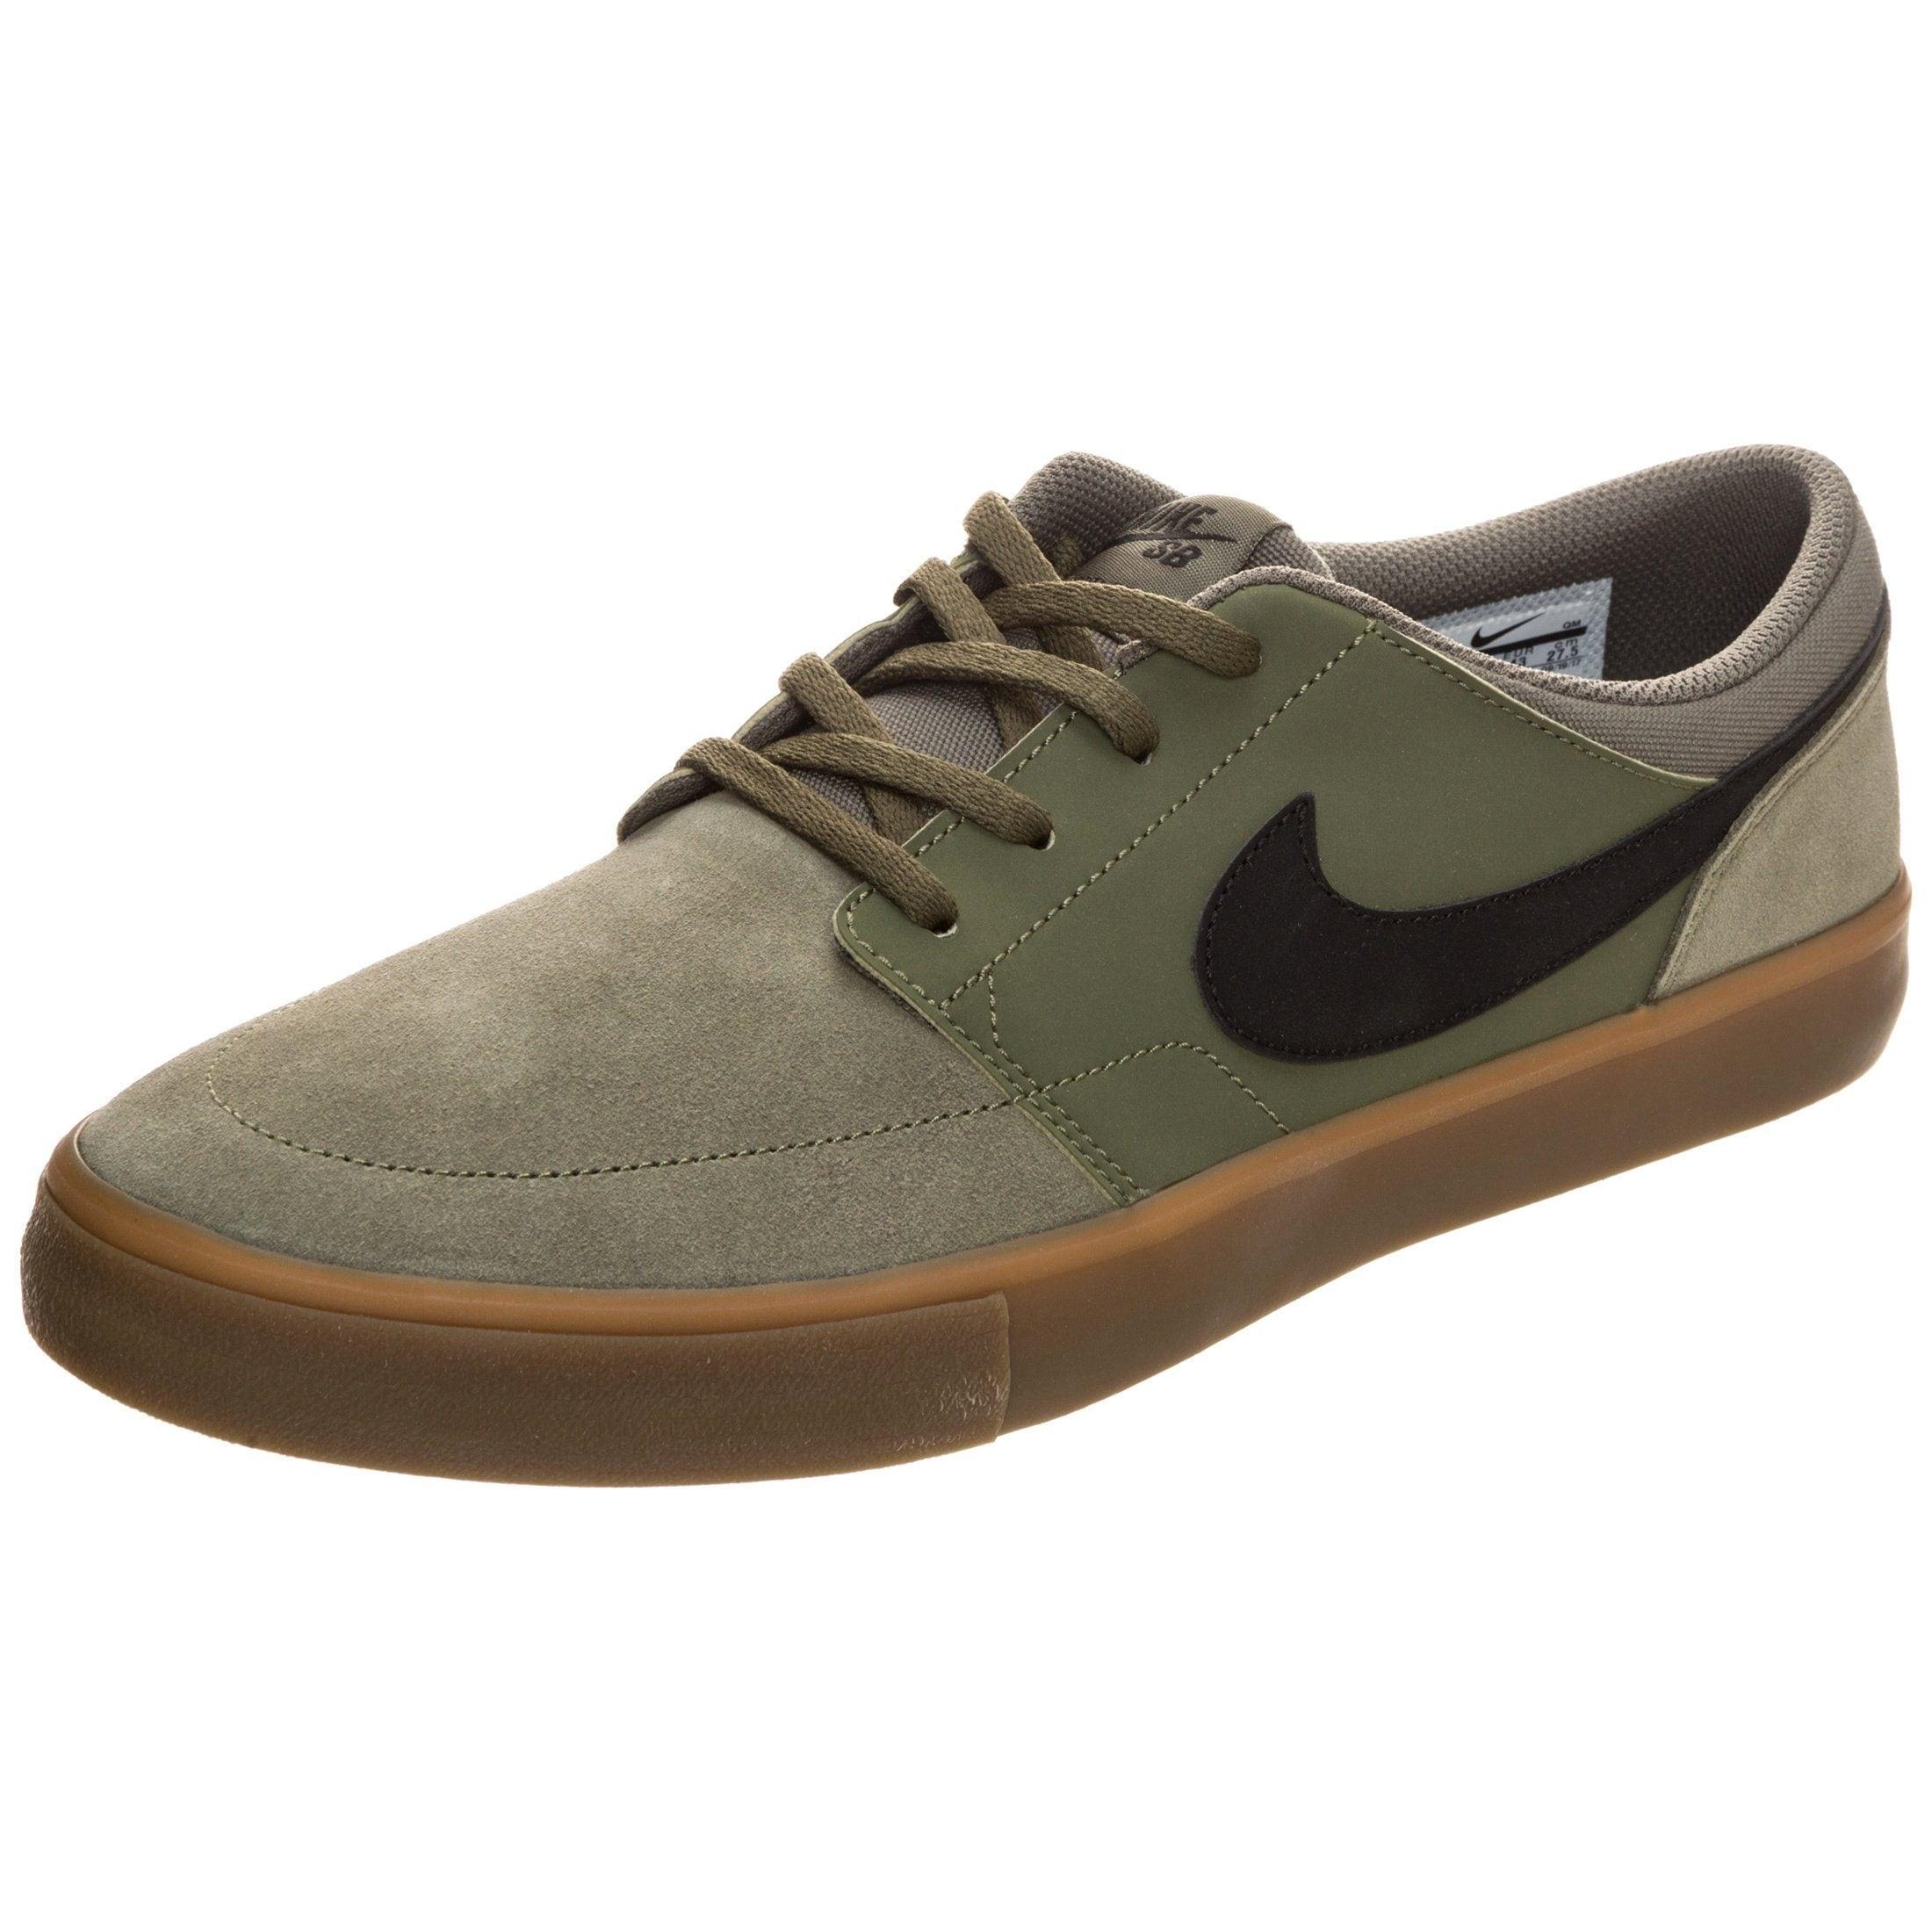 Nike SB Sneaker »Portmore Ii Solarsoft« | Schuhe > Schnürschuhe | Grün | Gummi | NIKE SB